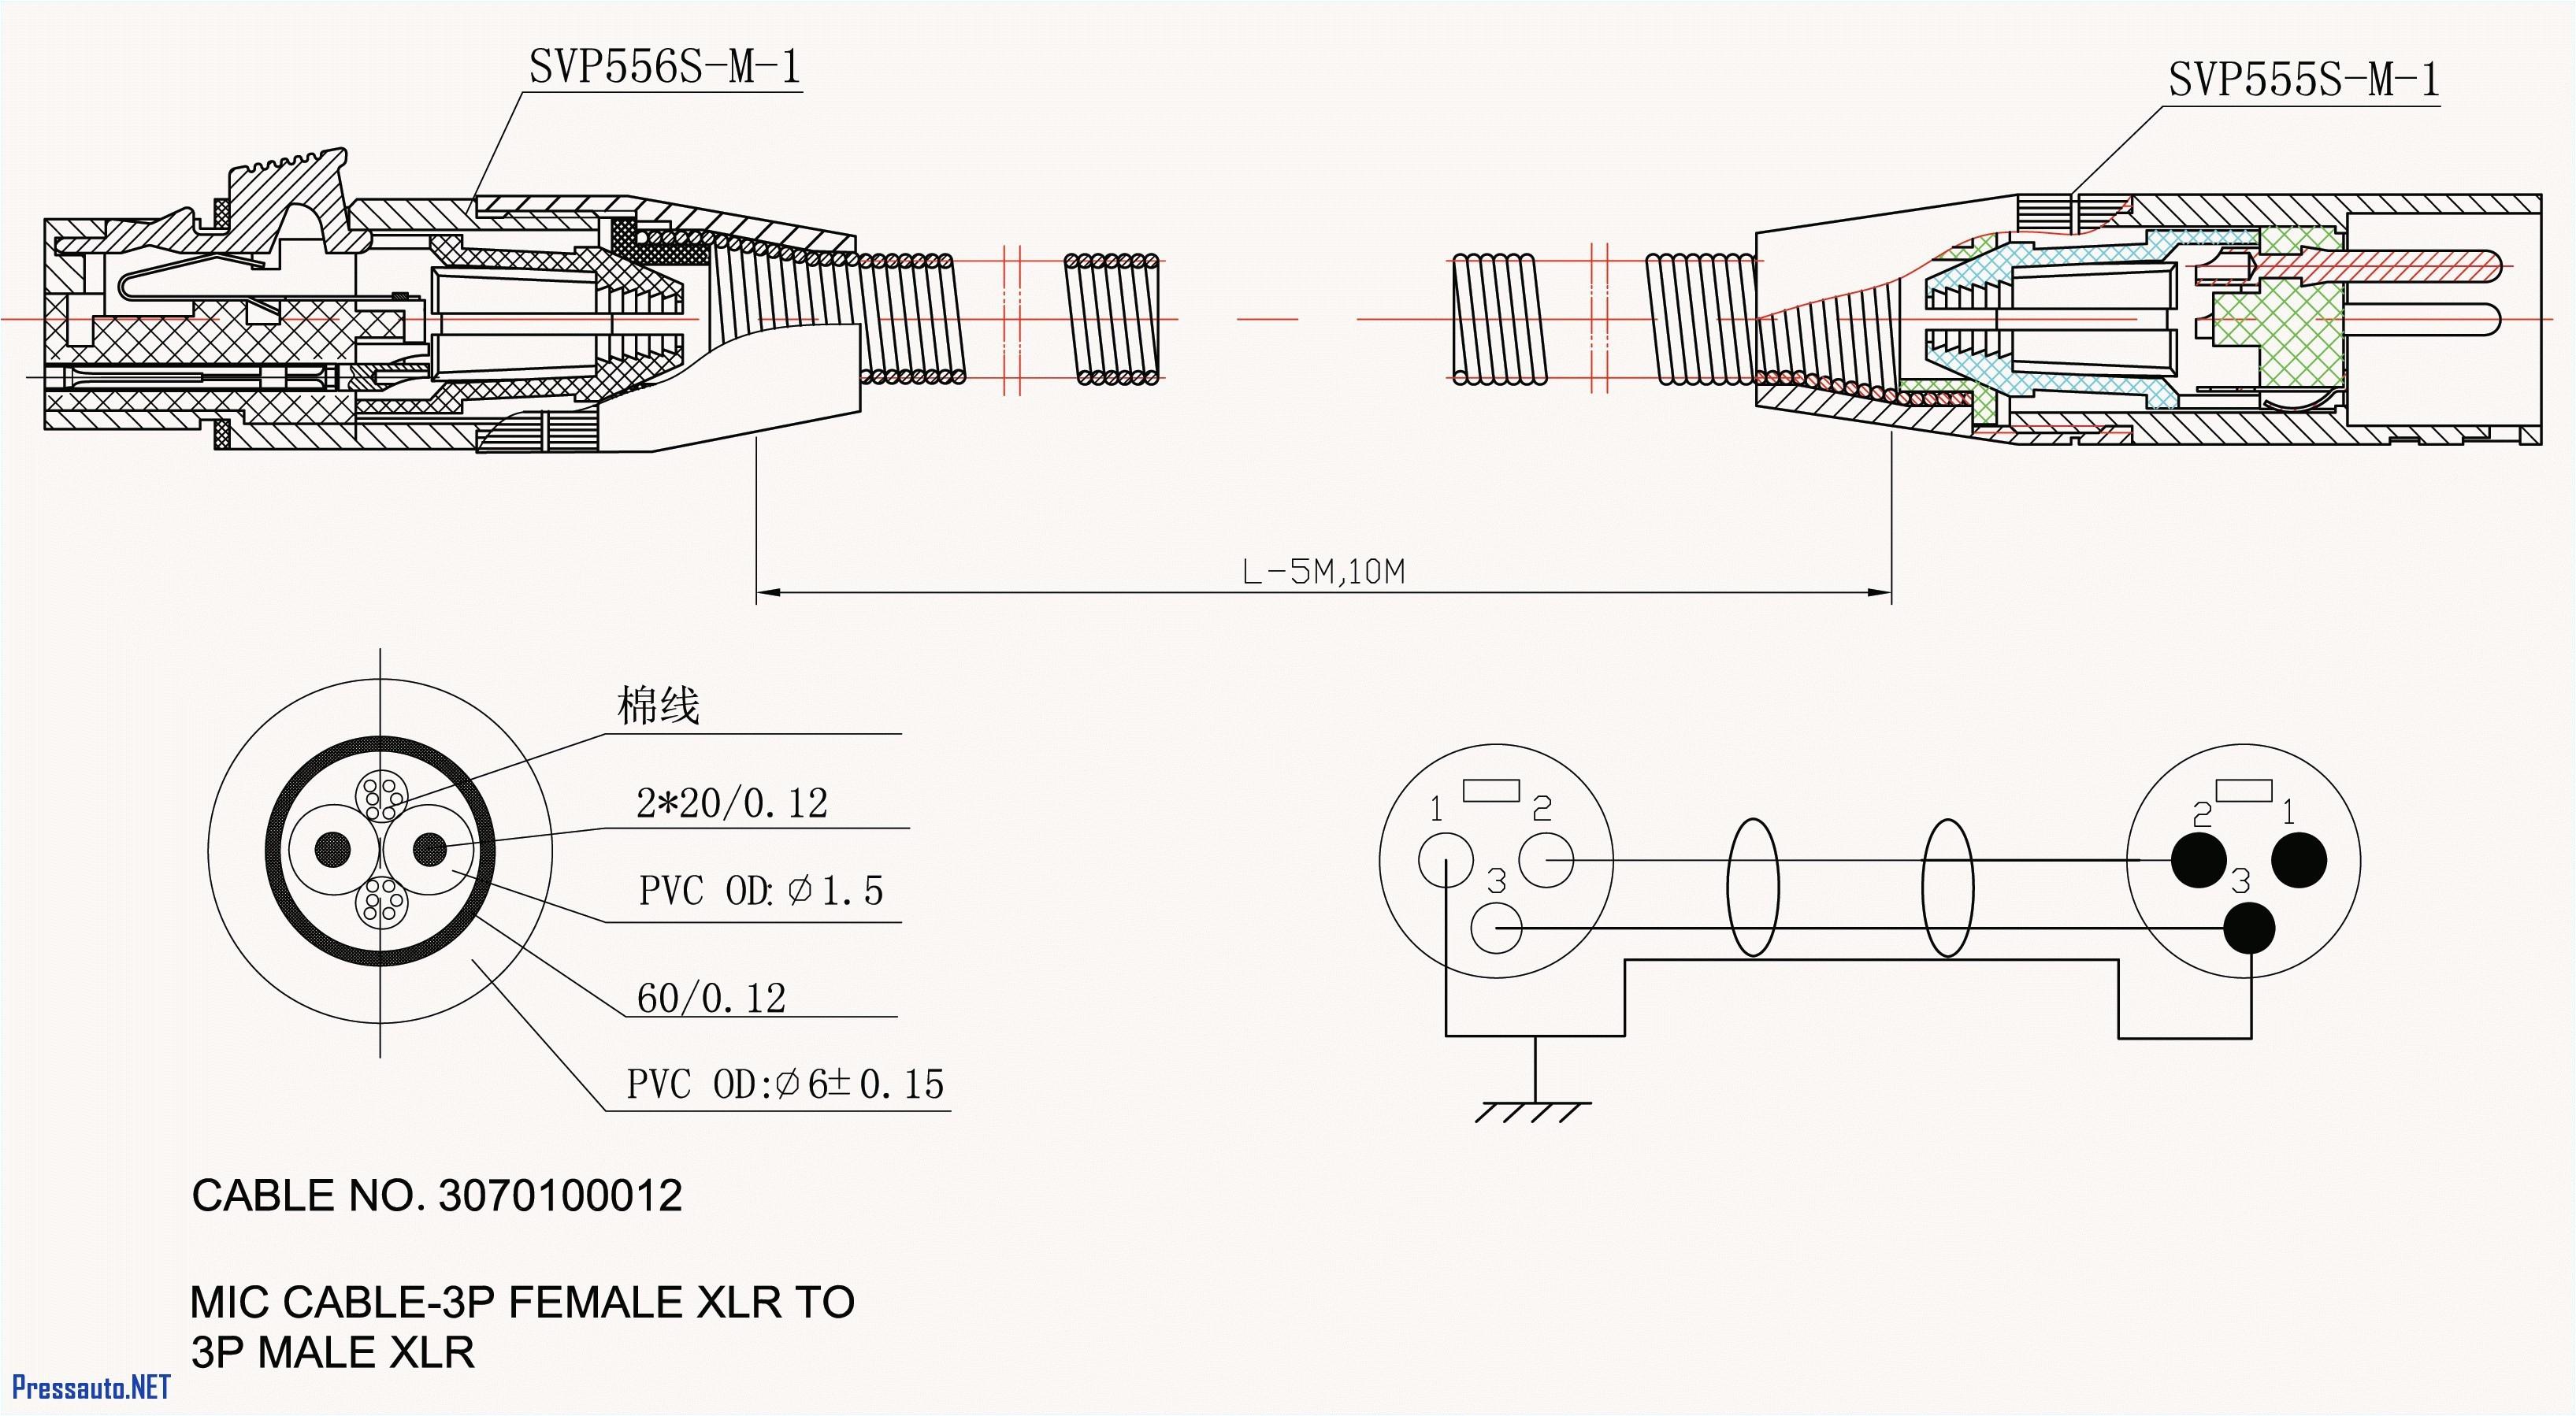 22r alternator wiring diagram inspirational best mopar starter relay wiring diagram electrical outlet